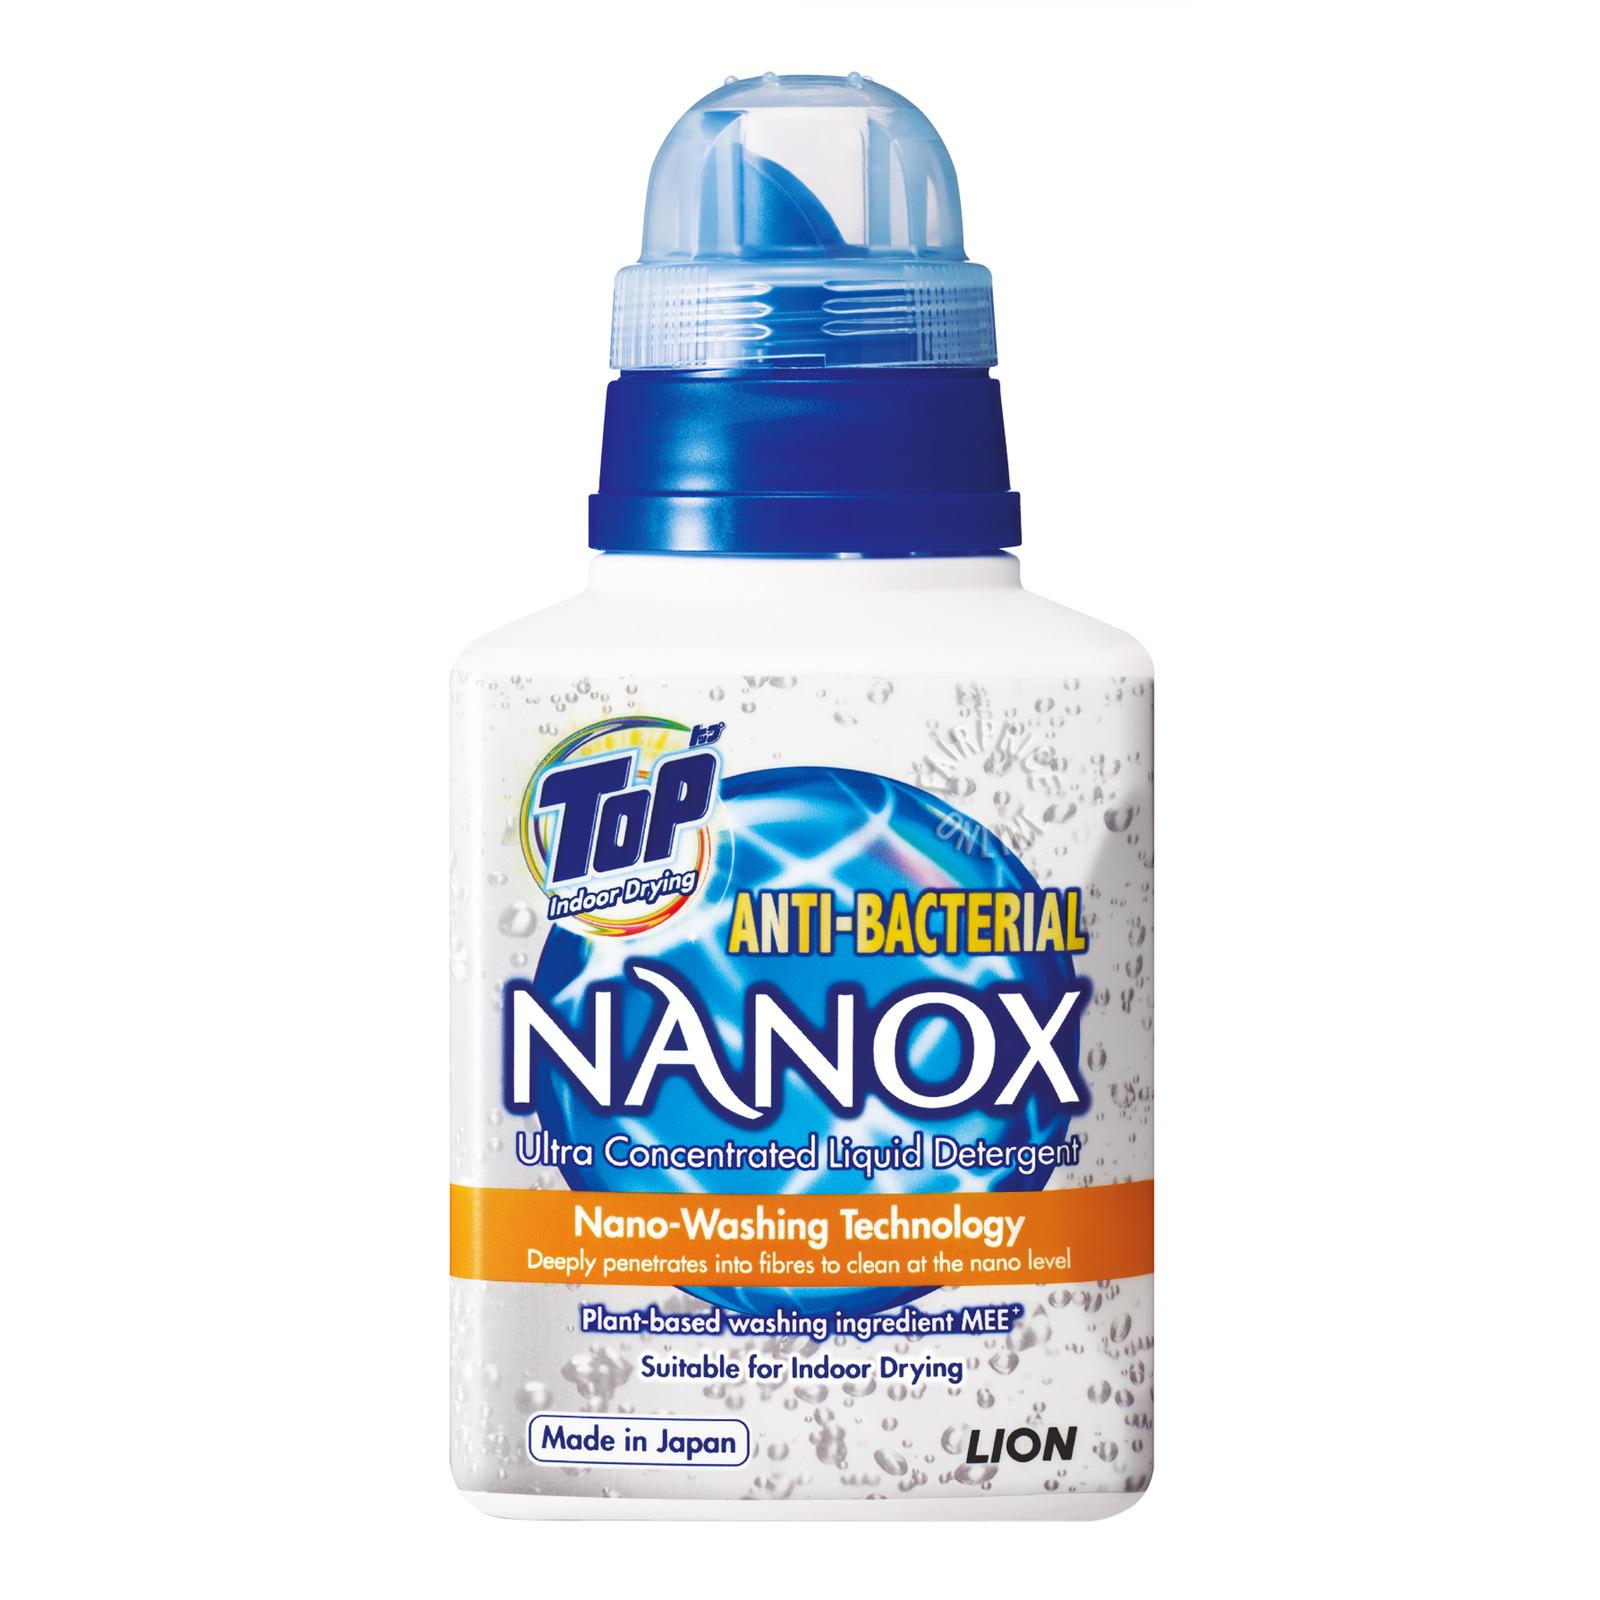 Top Nanox Ultra Concentrated Liquid Detergent - Anti-Bacterial